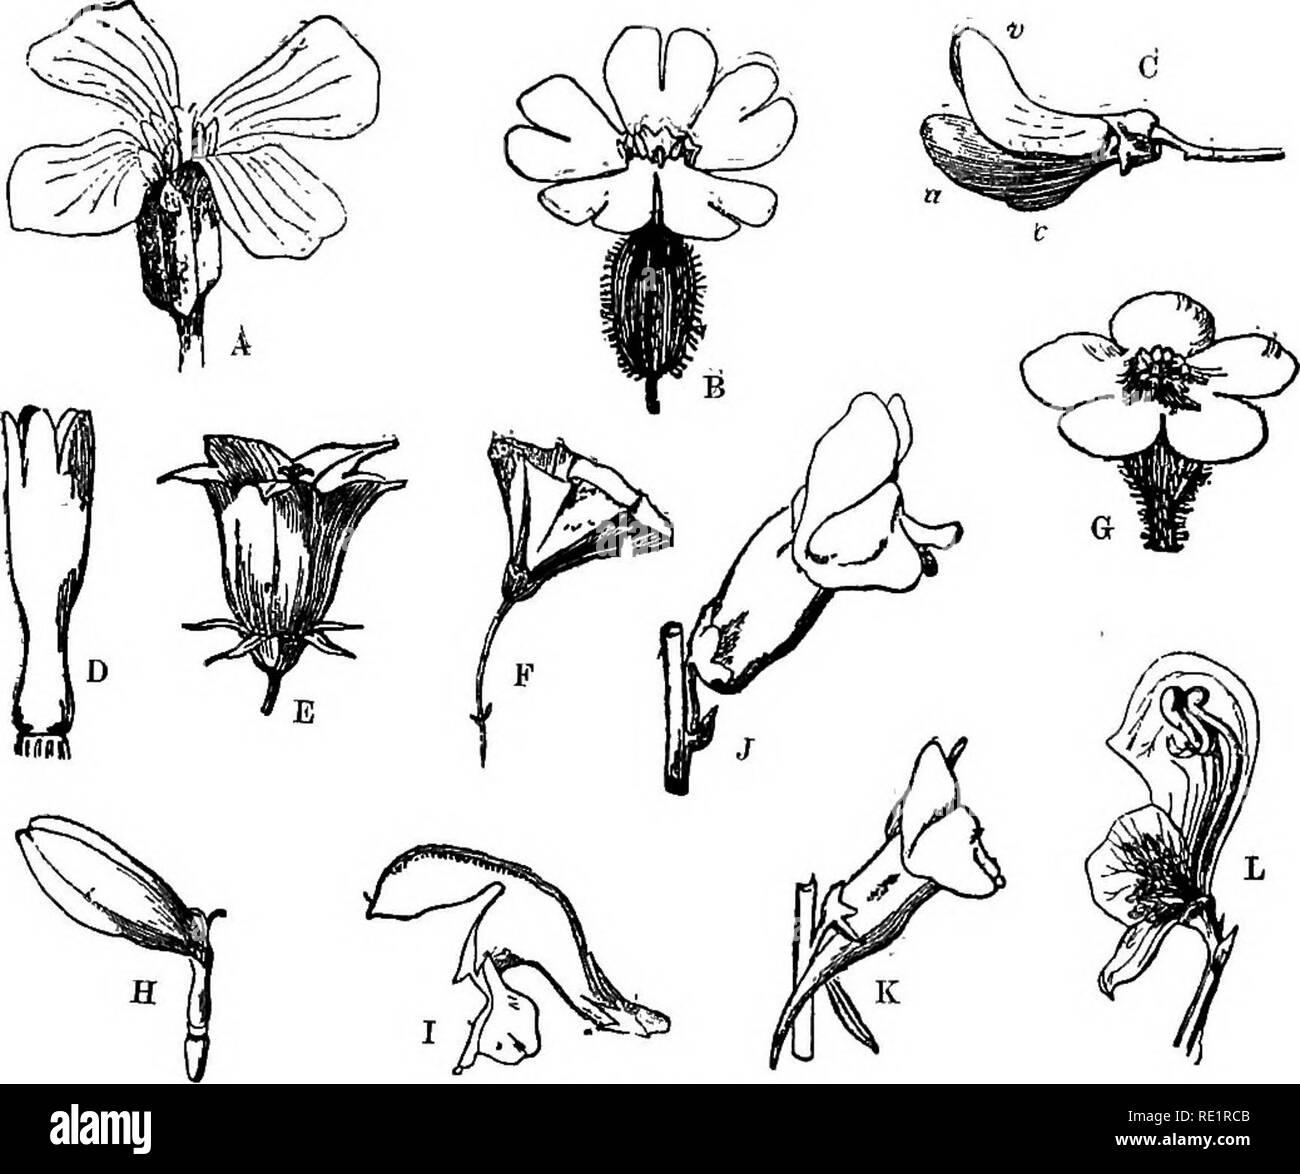 . A manual of Indian botany. Botany. THE FLOWER 8f hiiikhi or Sunflower, and gendha; (2) campanIiLate or bell-shaped—E, as in tepari {Physalis)i bhuin.^ kumrha {Ipomcea pamculata), kalmi-shag (tpomcea reptans); (3) infundibuliform or funnel=shaped—F, as in Datura, Tobacco, kalika-phul; (4) hypocRA-. Fig. 82.—Forms of Corolla A, Cruciform. b, Caryophyllaceous. o, Papilionaceous. D, Tubular. E, Cam- panulate. F, Funnel-shaped. G, Rotate. H, Ligulate. I, Bilabiate. J, Personate. K, Personate and spurred, l.. Nectaries. TERiFORM or salver-shaped, as in taru-lata {Quamoclii pinnata), rangan {Ixora  - Stock Image